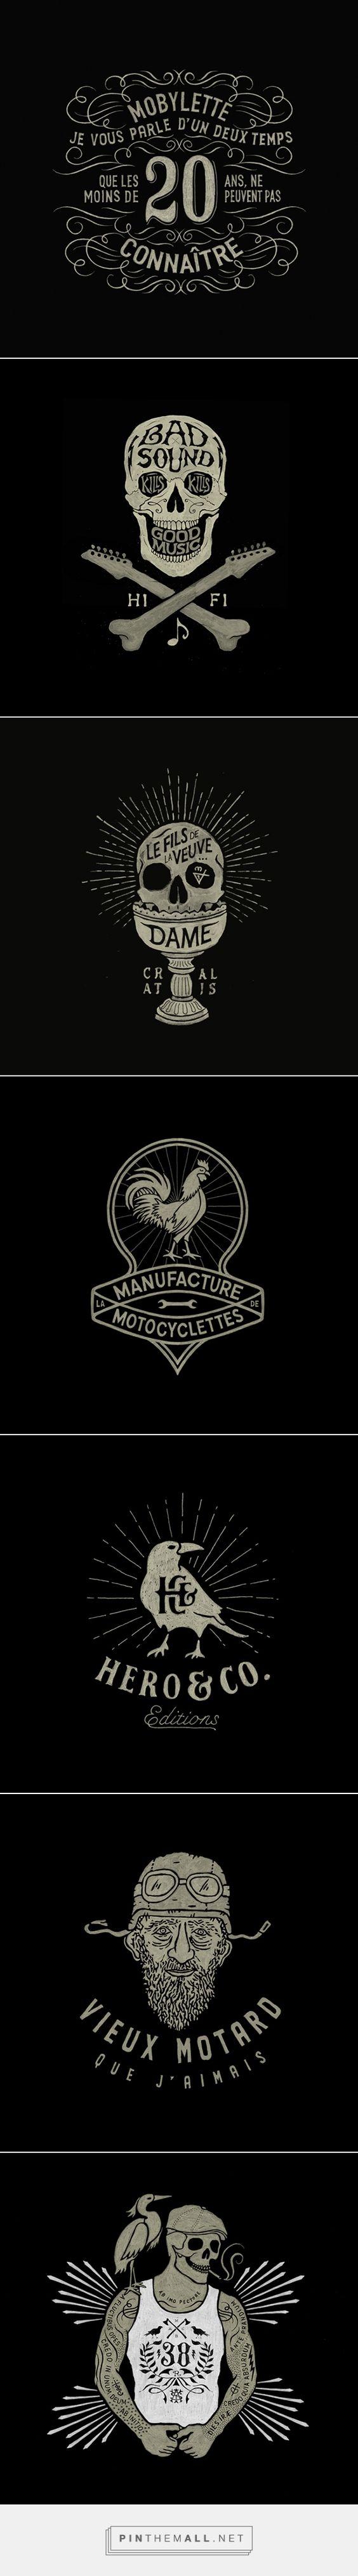 Prints & Logos by BMD